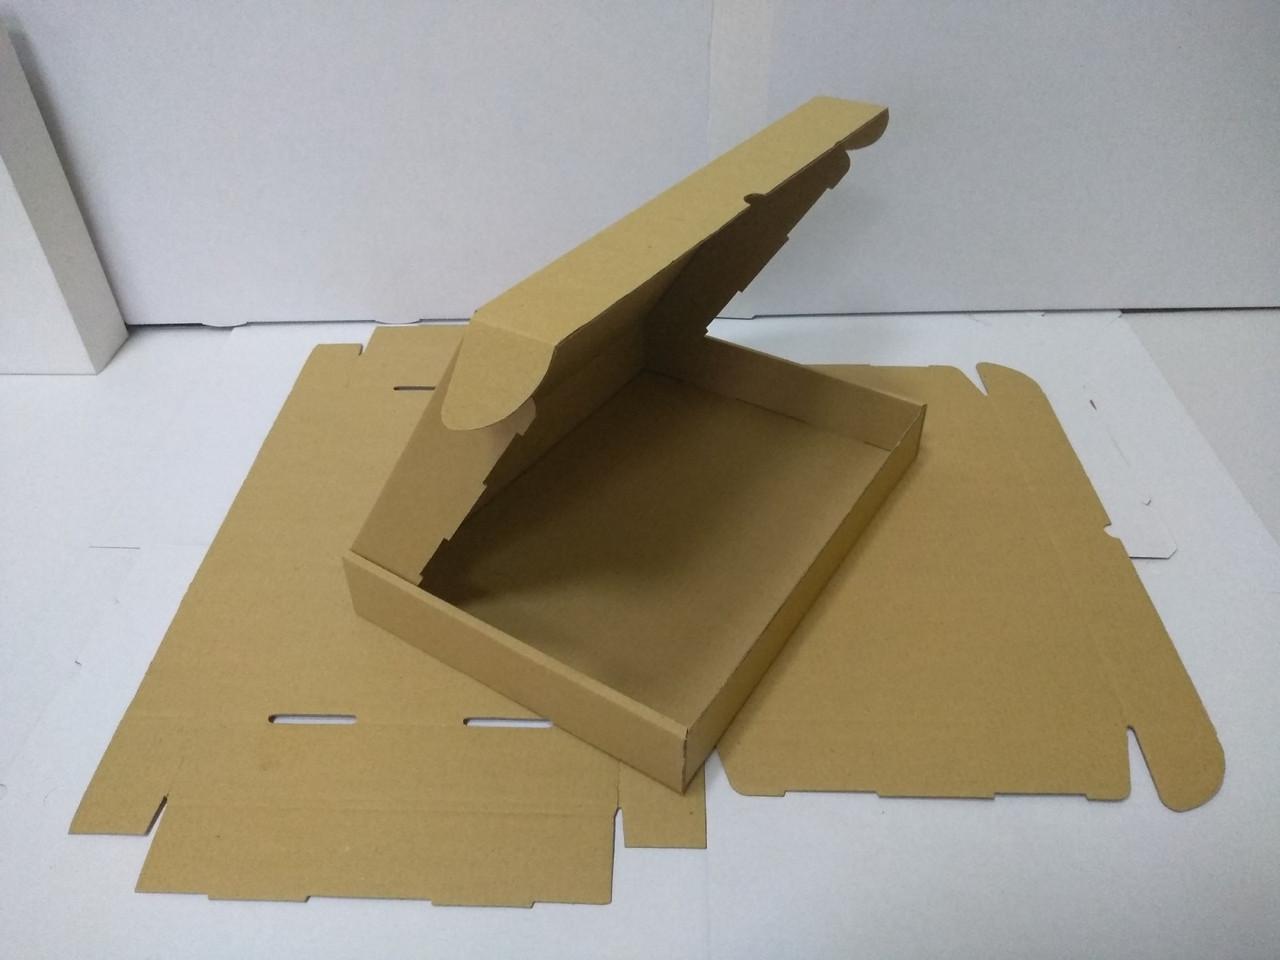 Коробка картонная 34х24х5 (см) 1 кг бурая. Коробки для почты 340 х 240 х 50 мм.